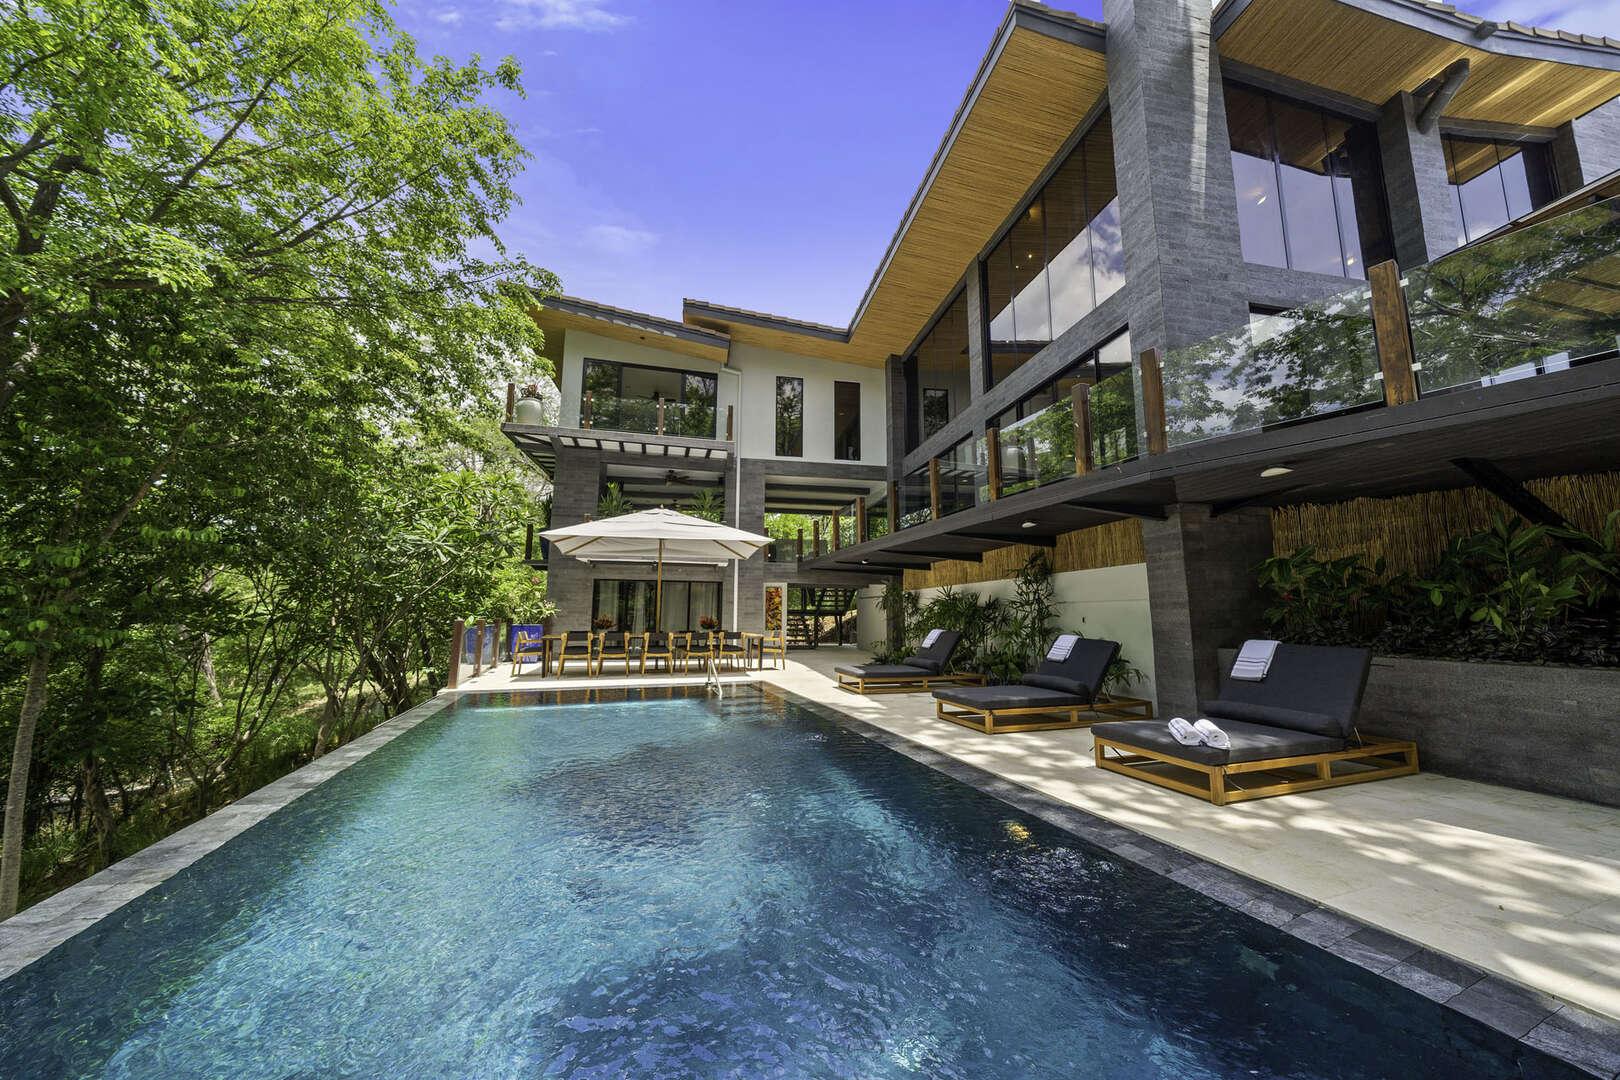 - Villa Nambi - Image 1/14